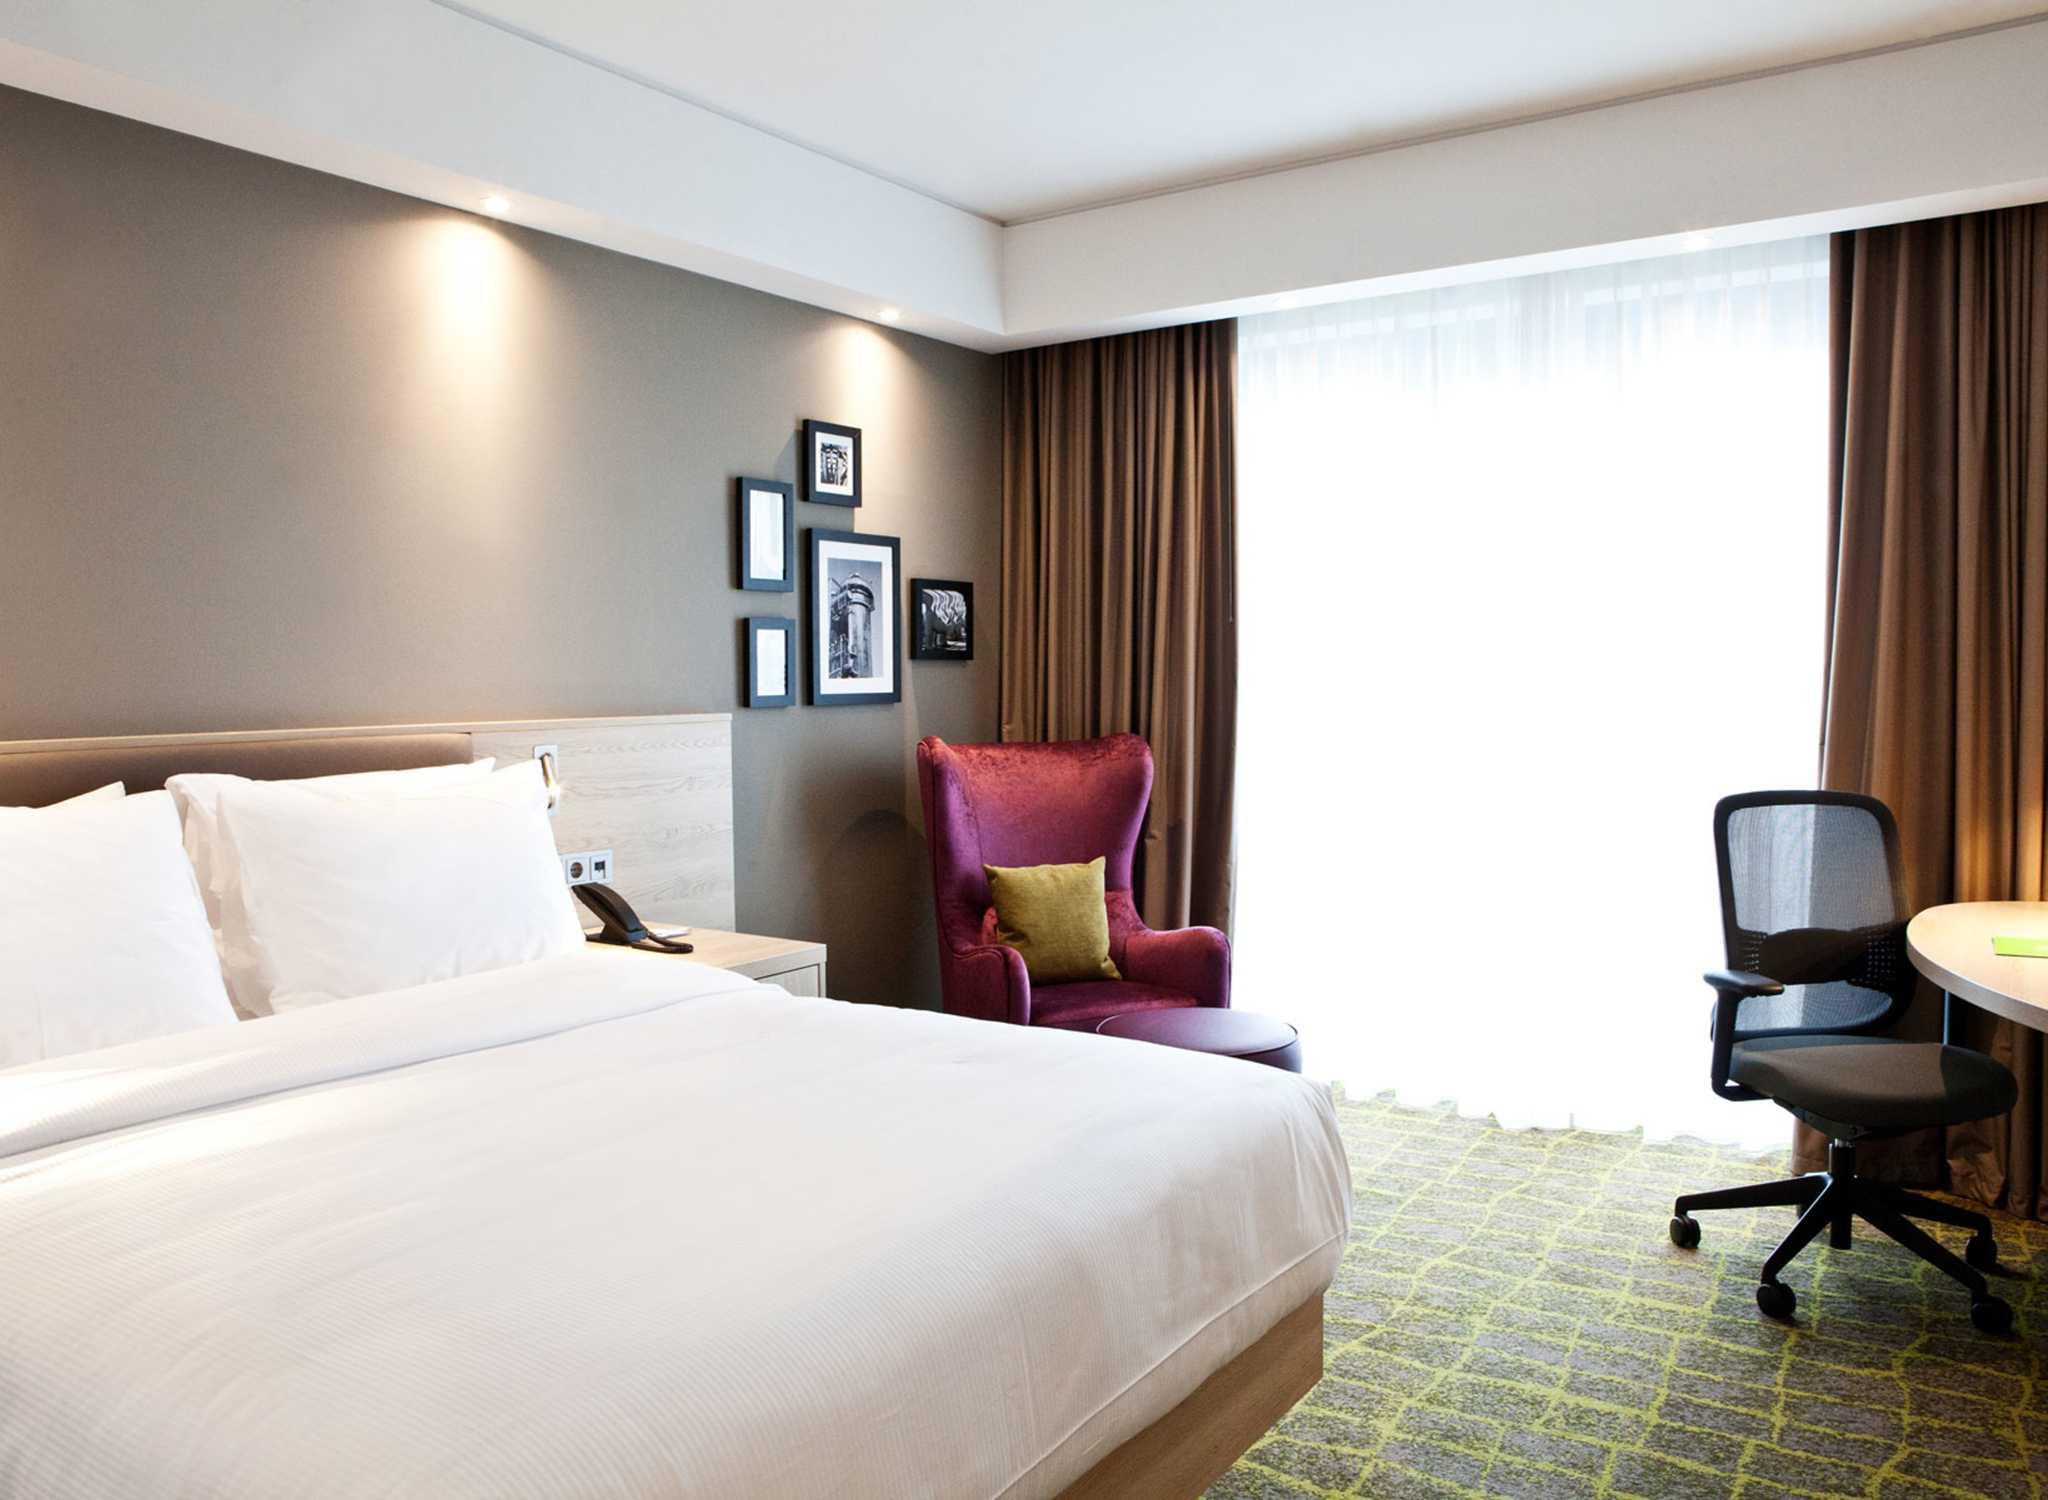 Hotel  Stunden Check In Berlin